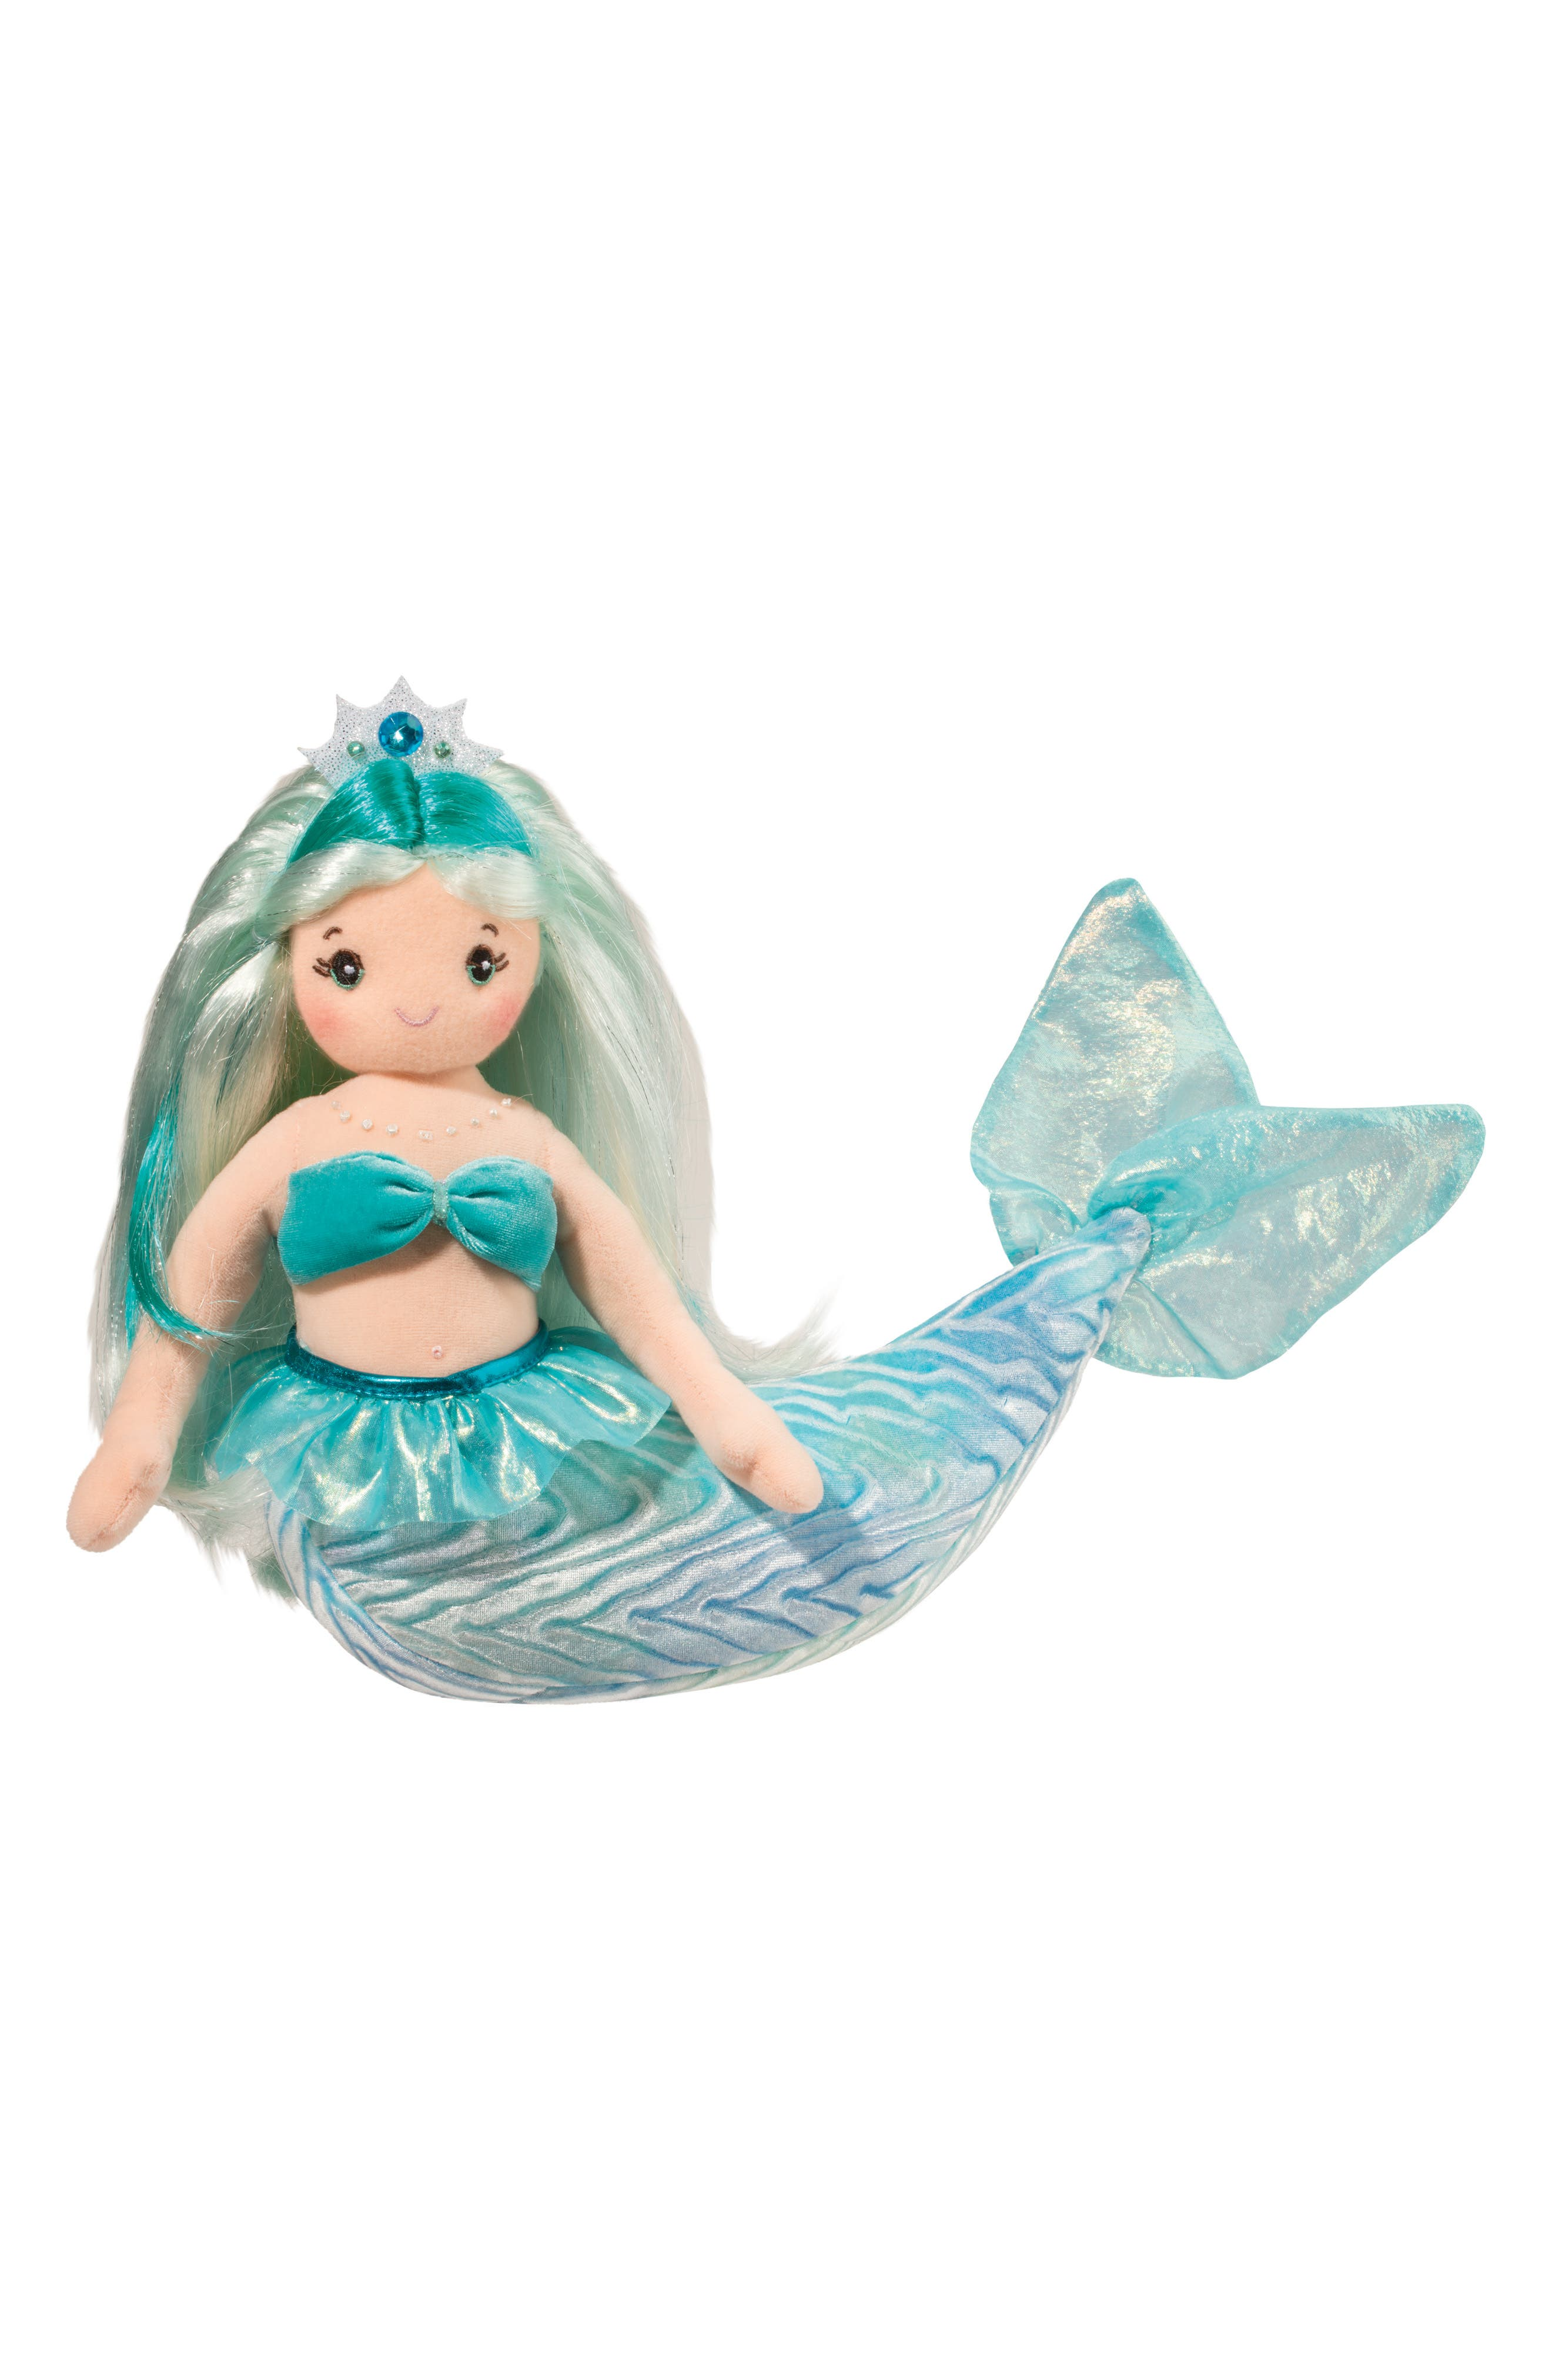 Ciara - Large Aqua Mermaid Doll,                         Main,                         color, Aqua